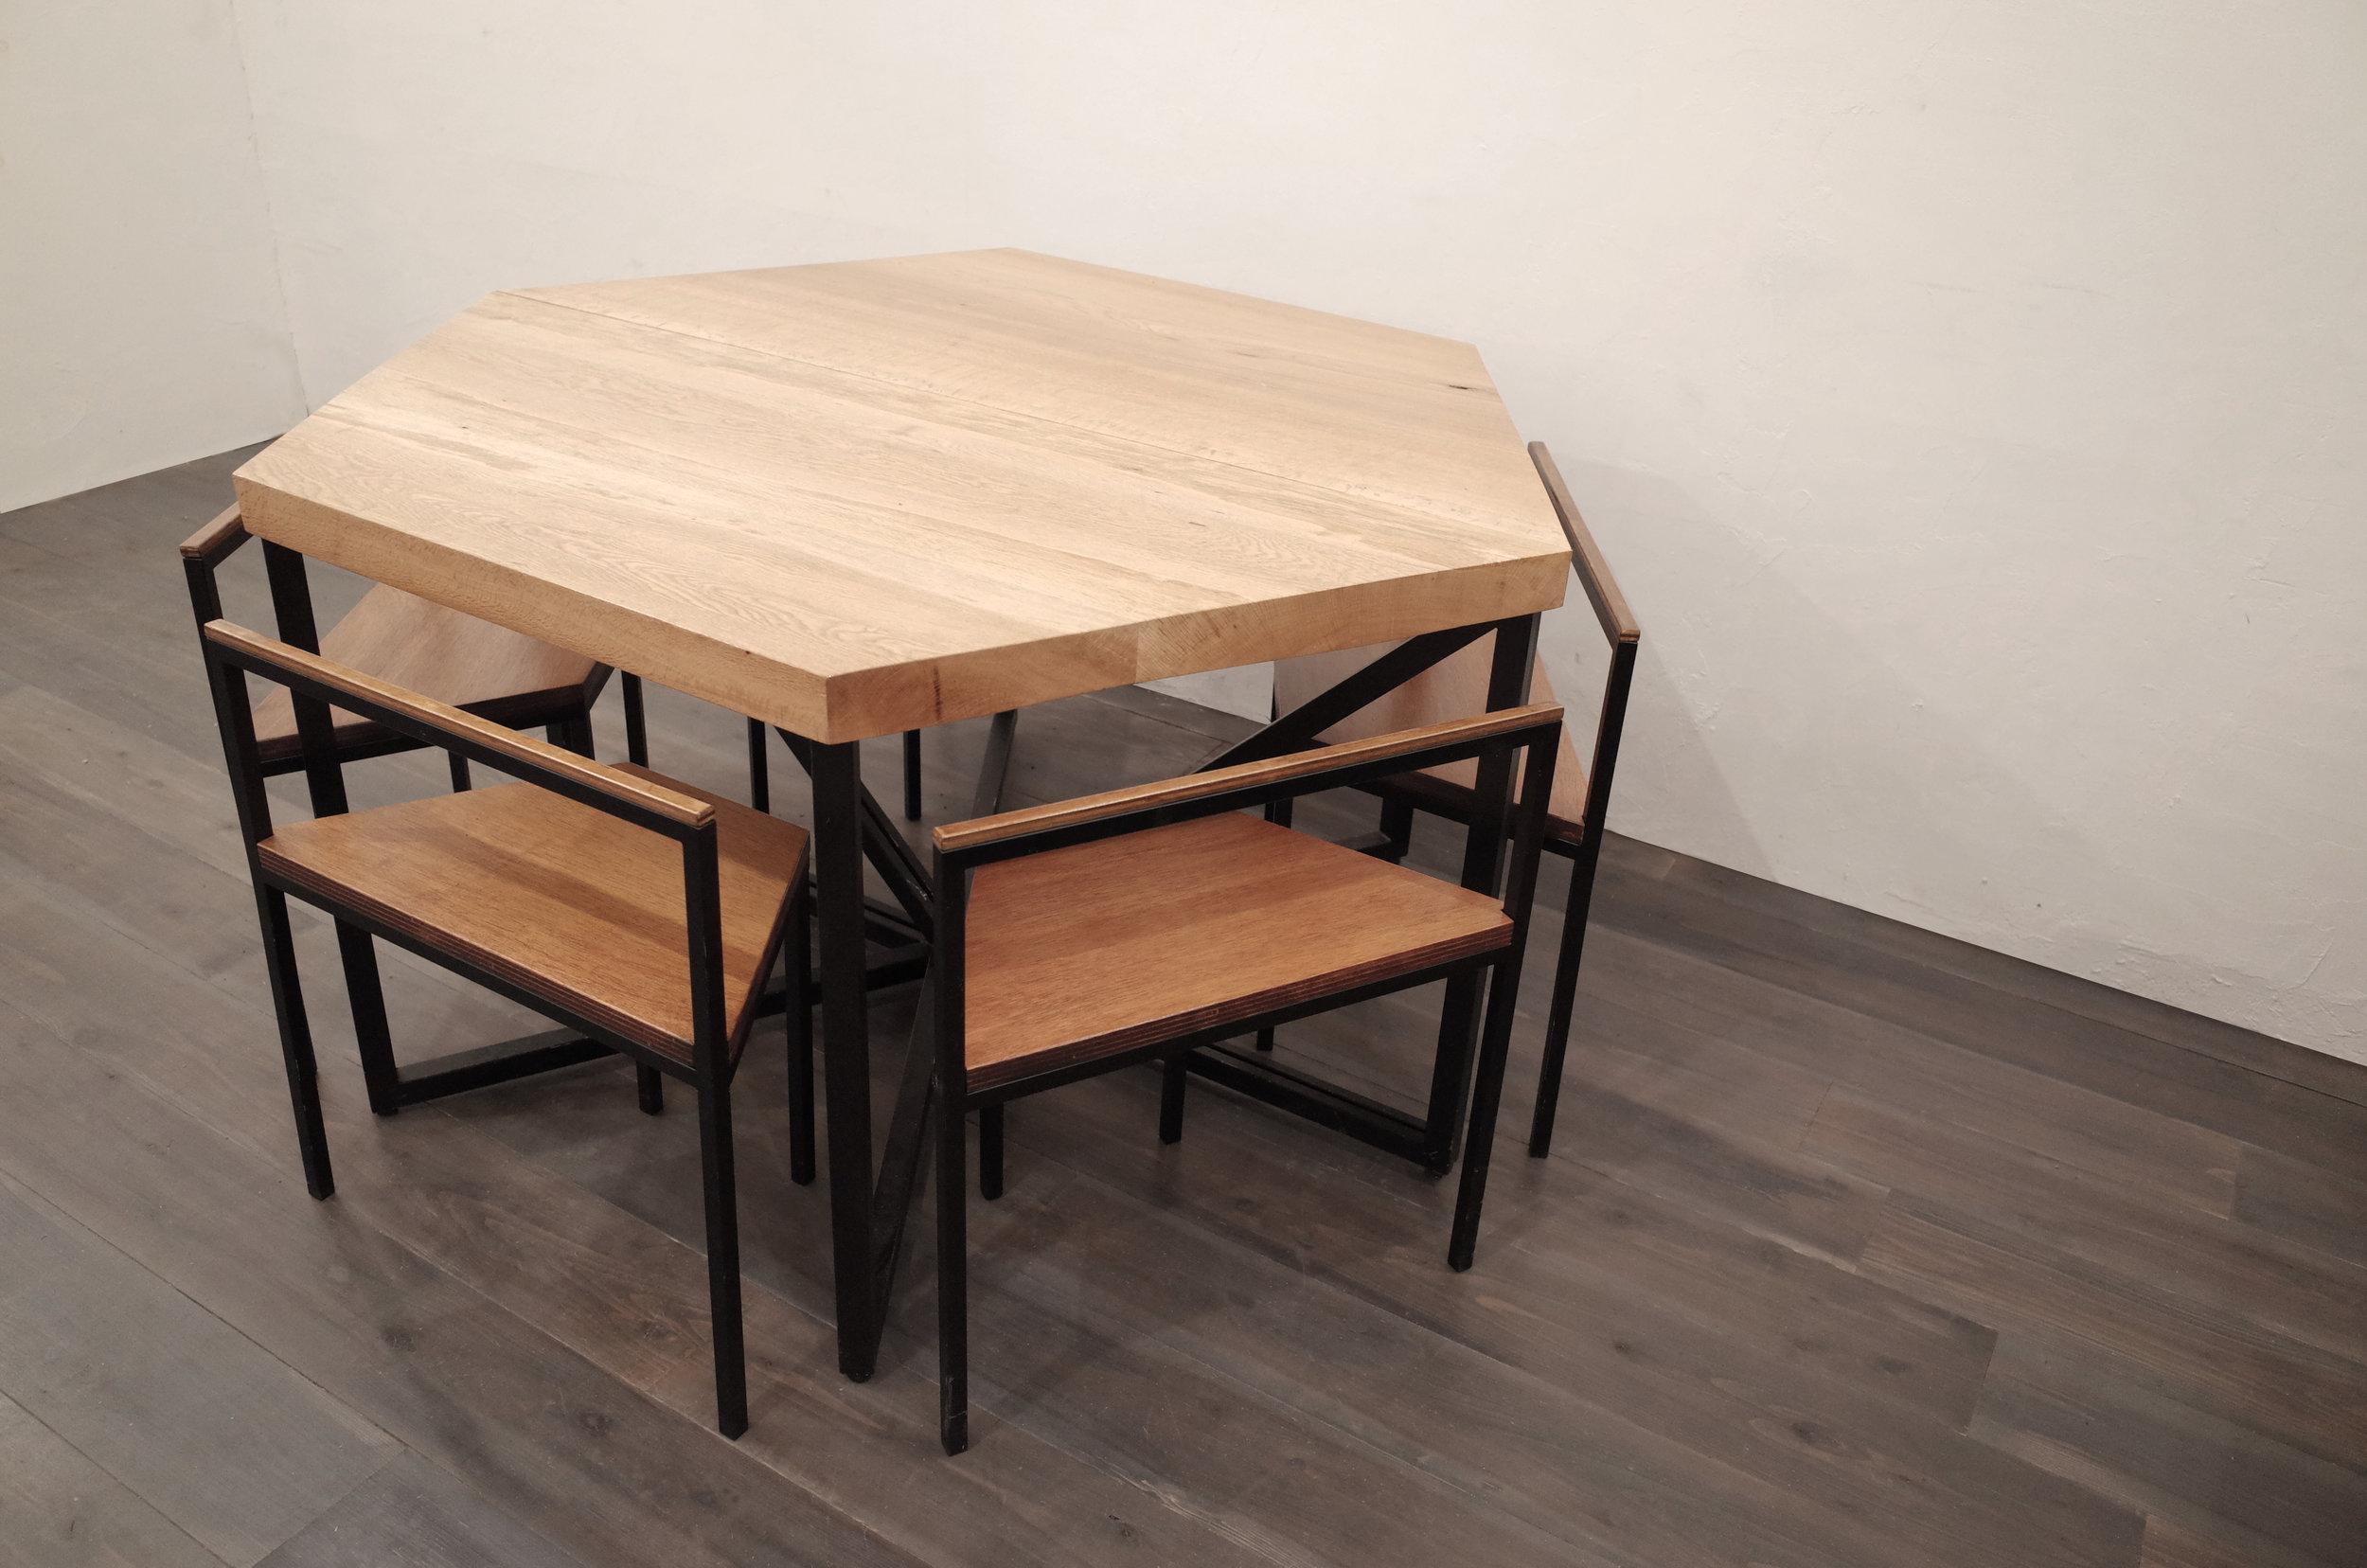 Hexagonal-table.jpg